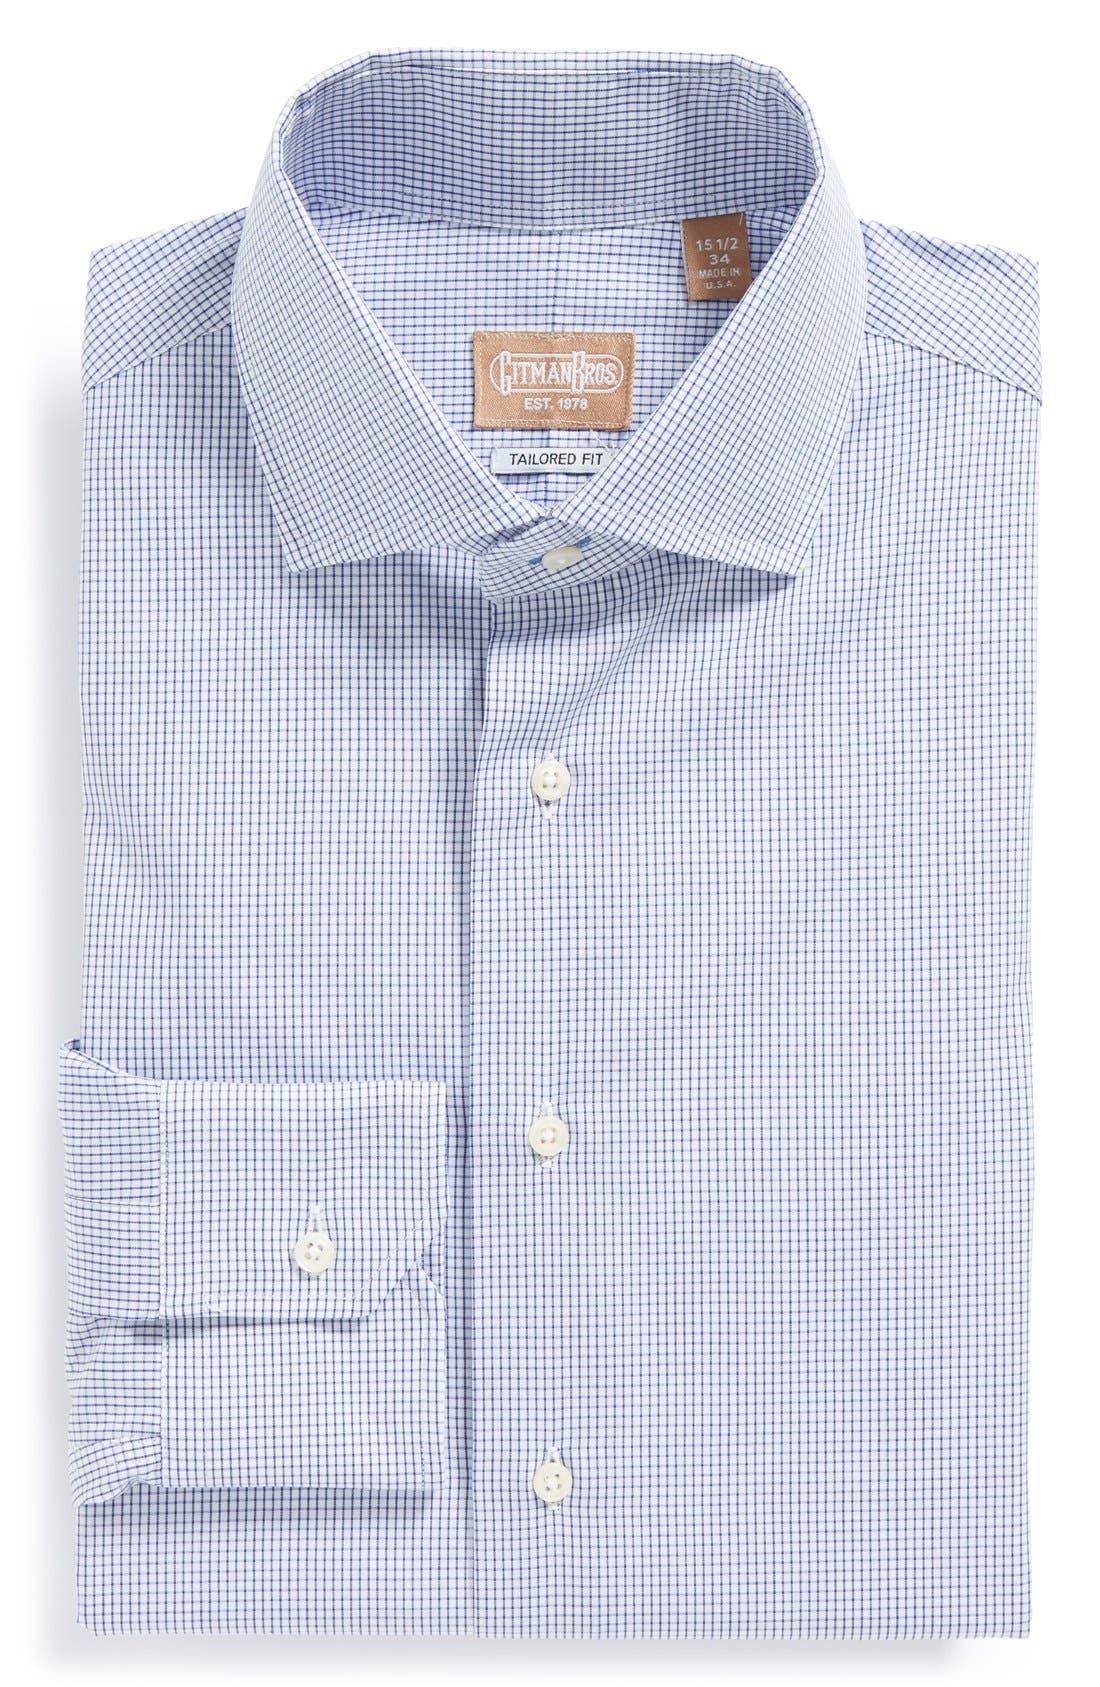 GITMAN, Tailored Fit Gingham Dress Shirt, Main thumbnail 1, color, NAVY